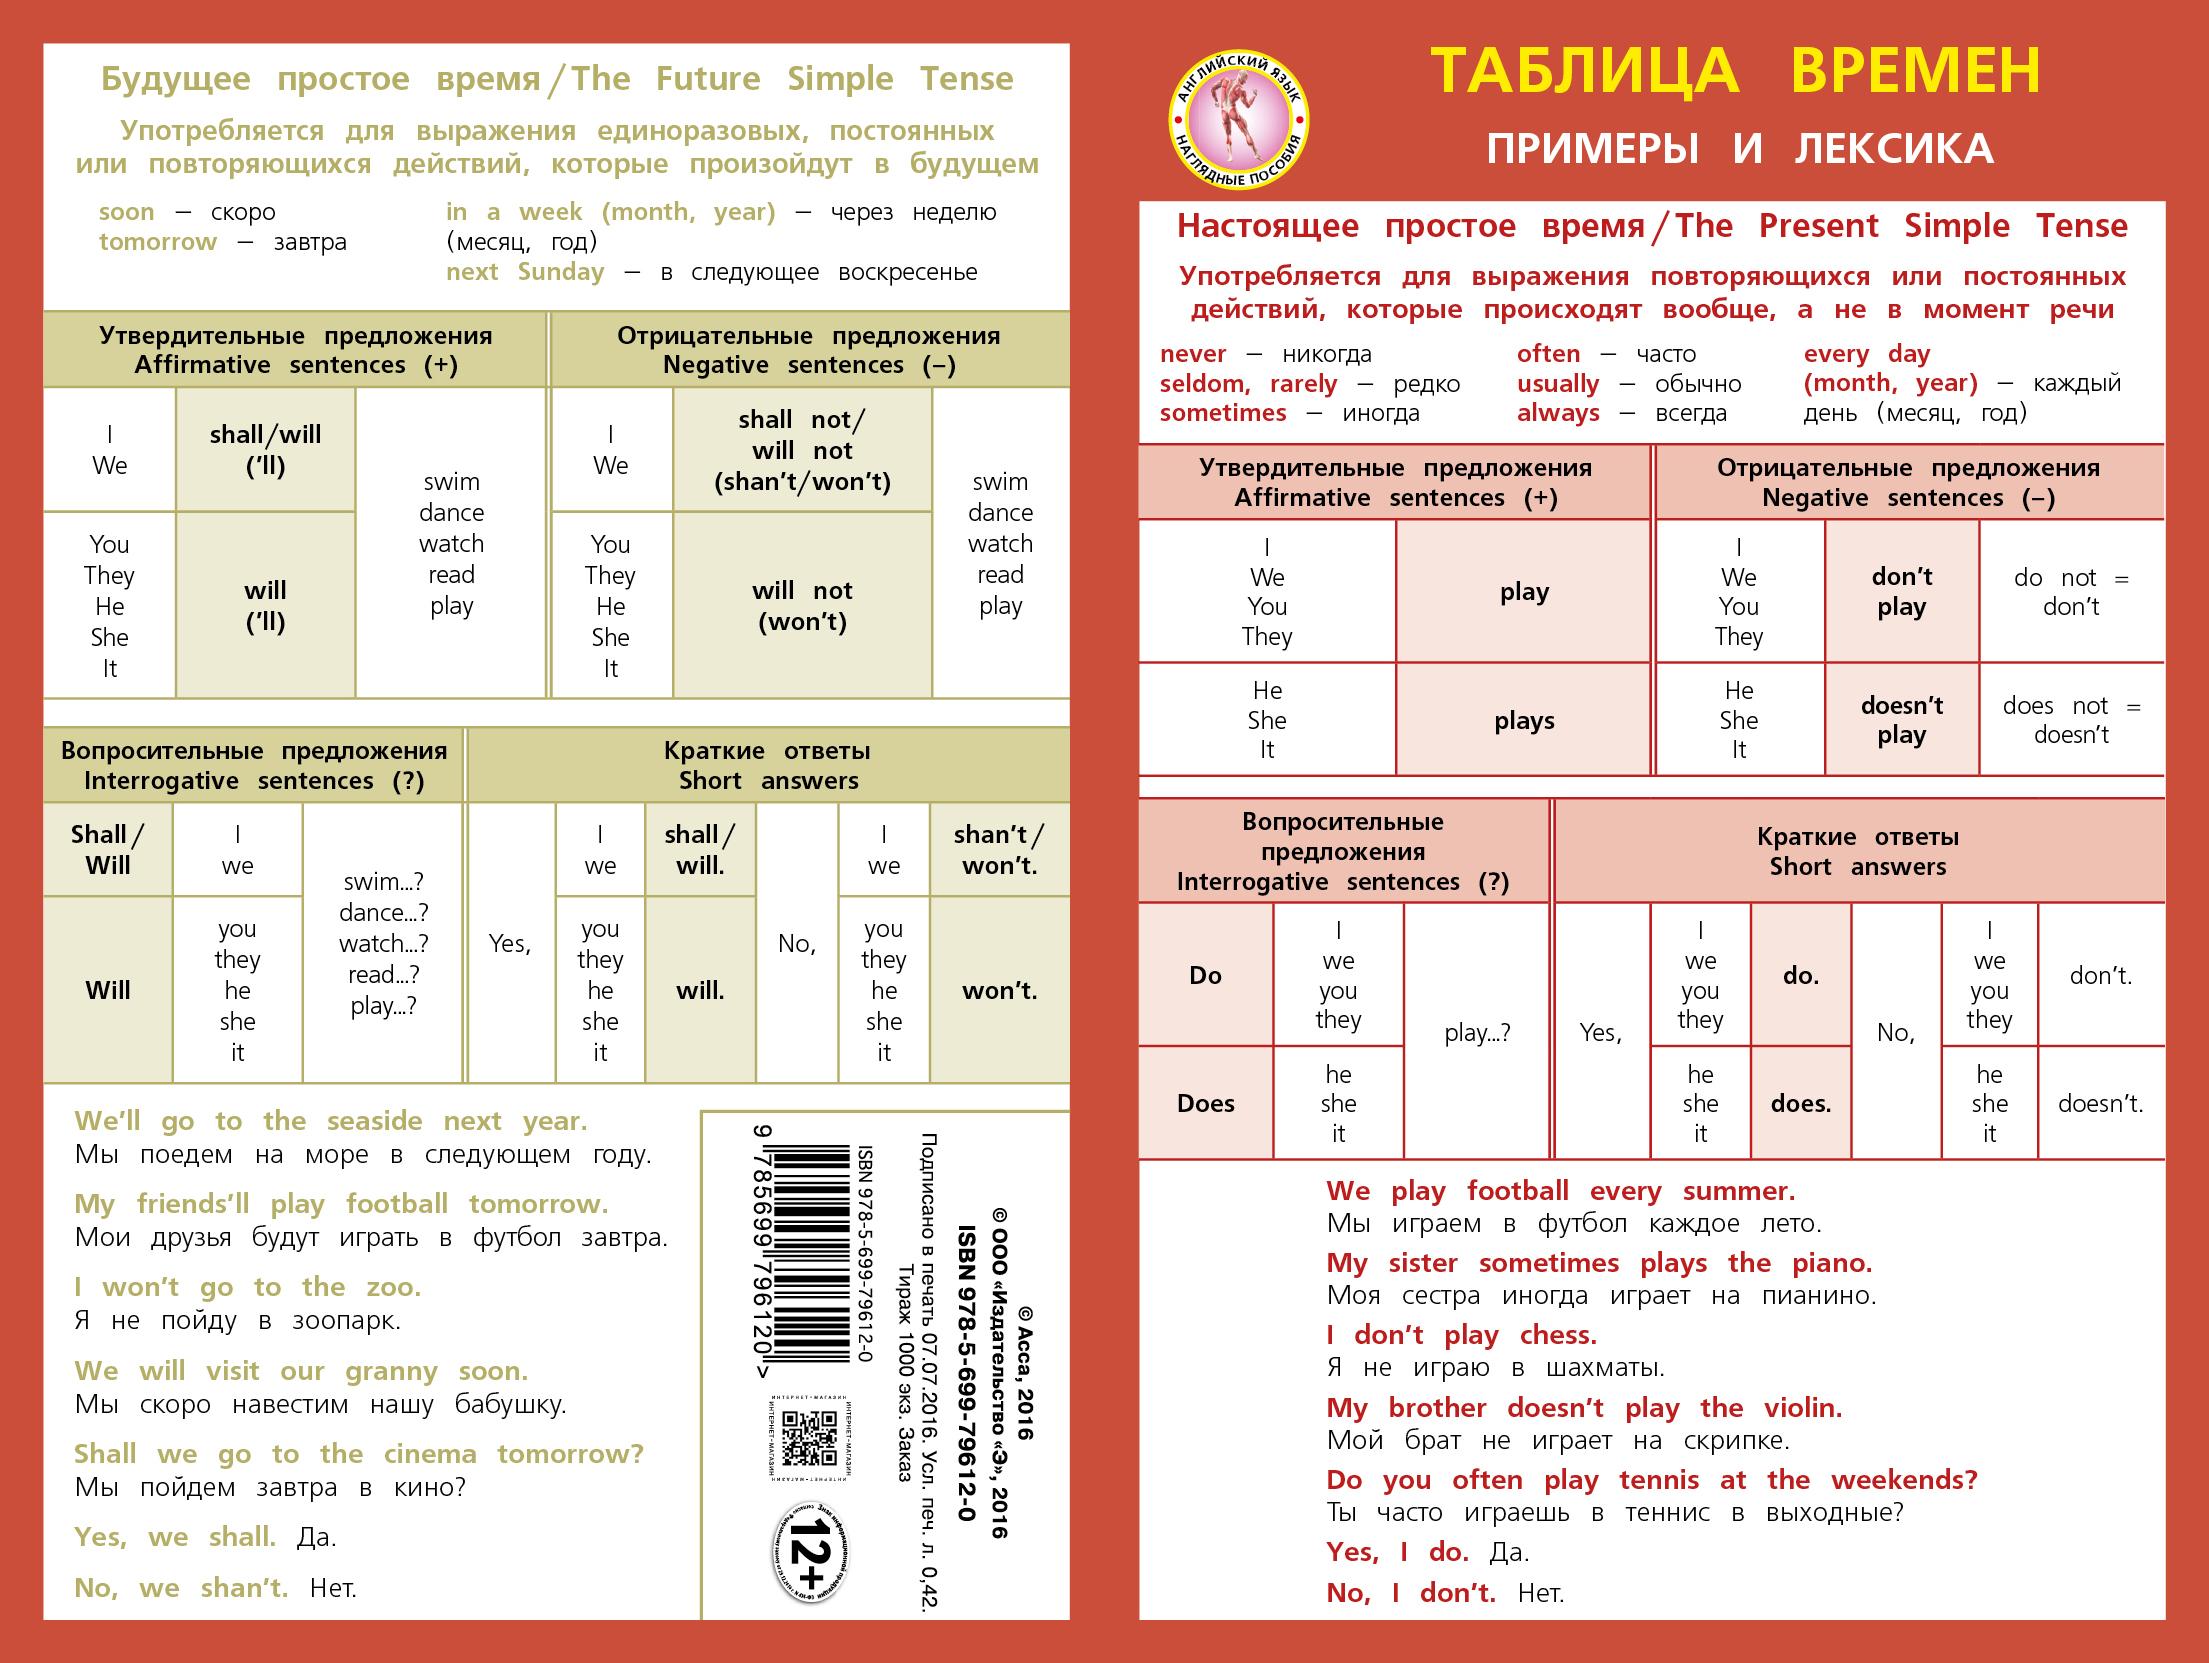 Английский язык: таблица времен